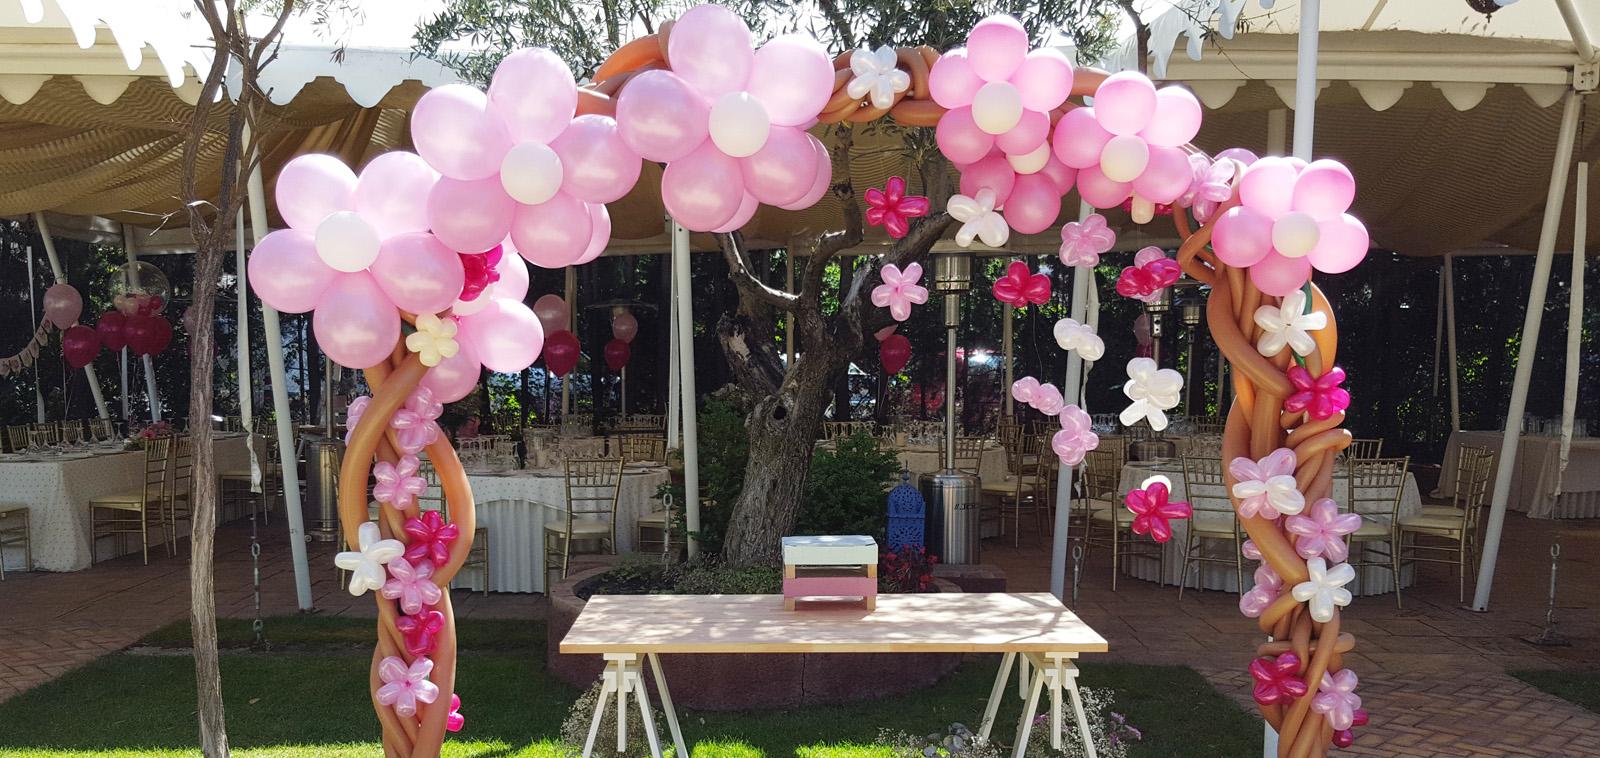 Decoraci n con globos para bodas en granada originalandia for Decoracion con globos bodas